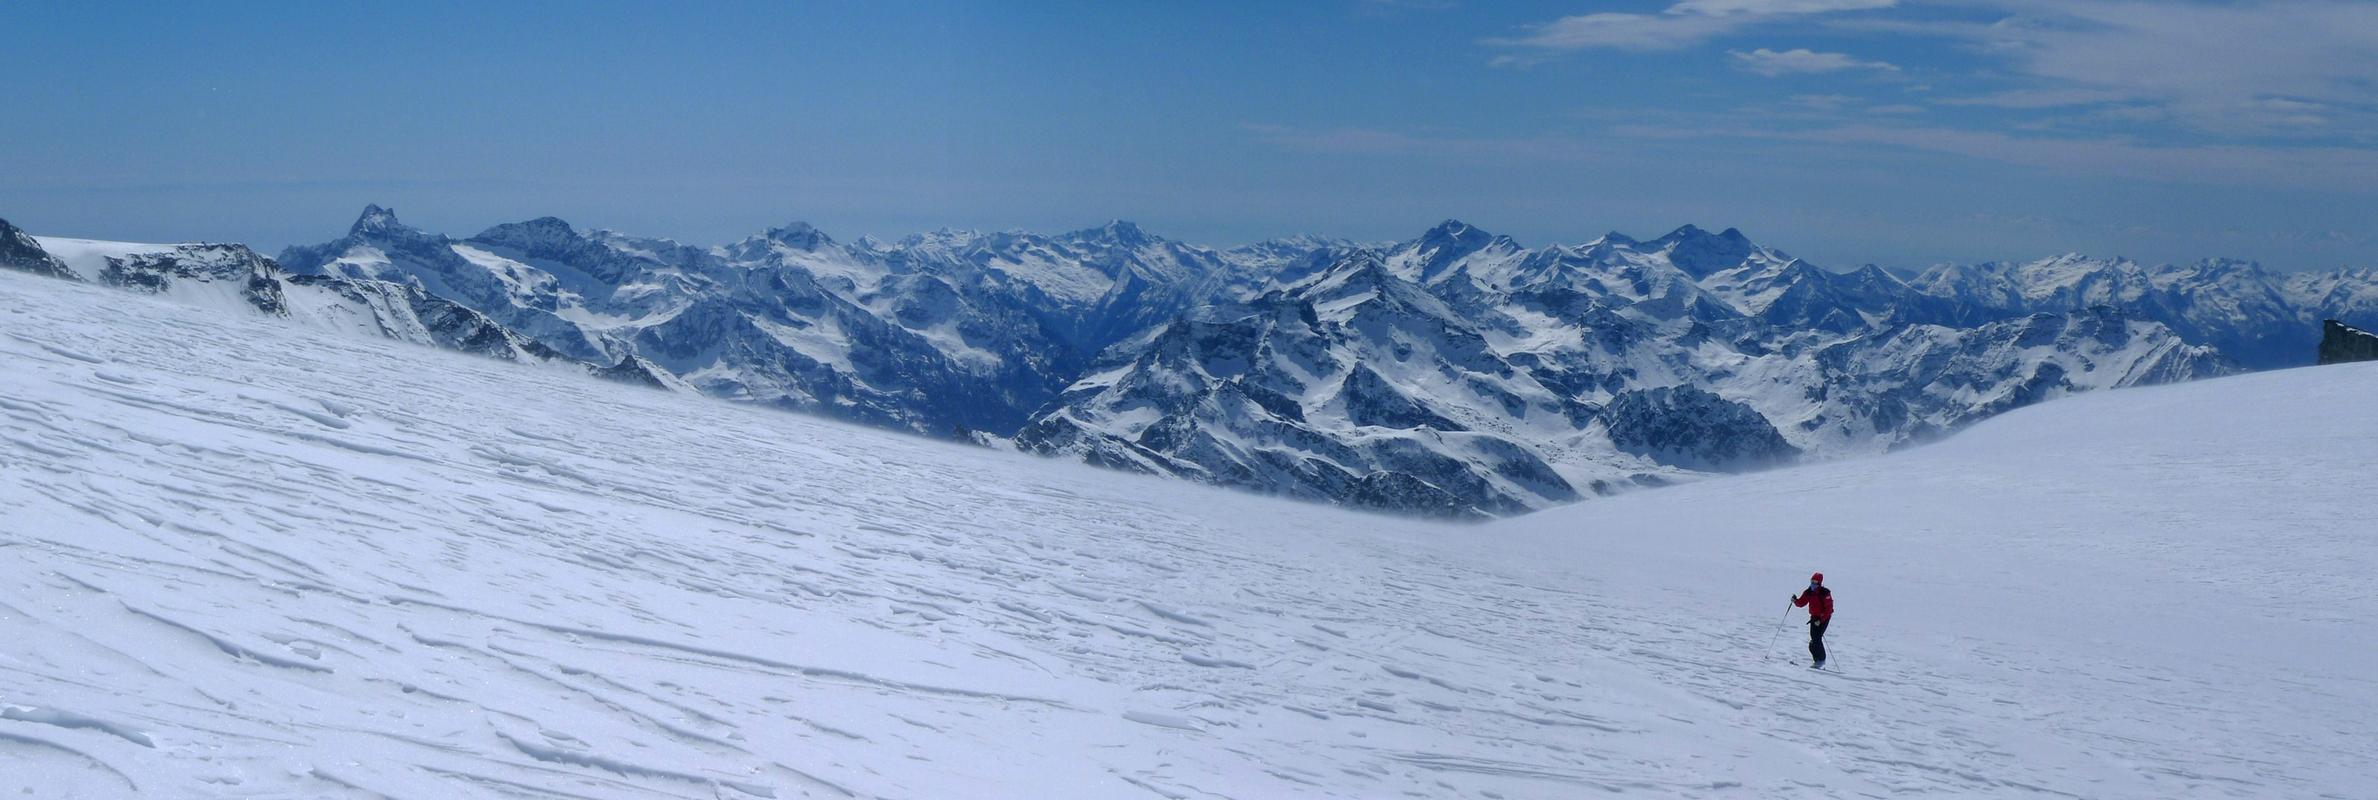 Breithorn - Zermatt Walliser Alpen / Alpes valaisannes Švýcarsko panorama 15